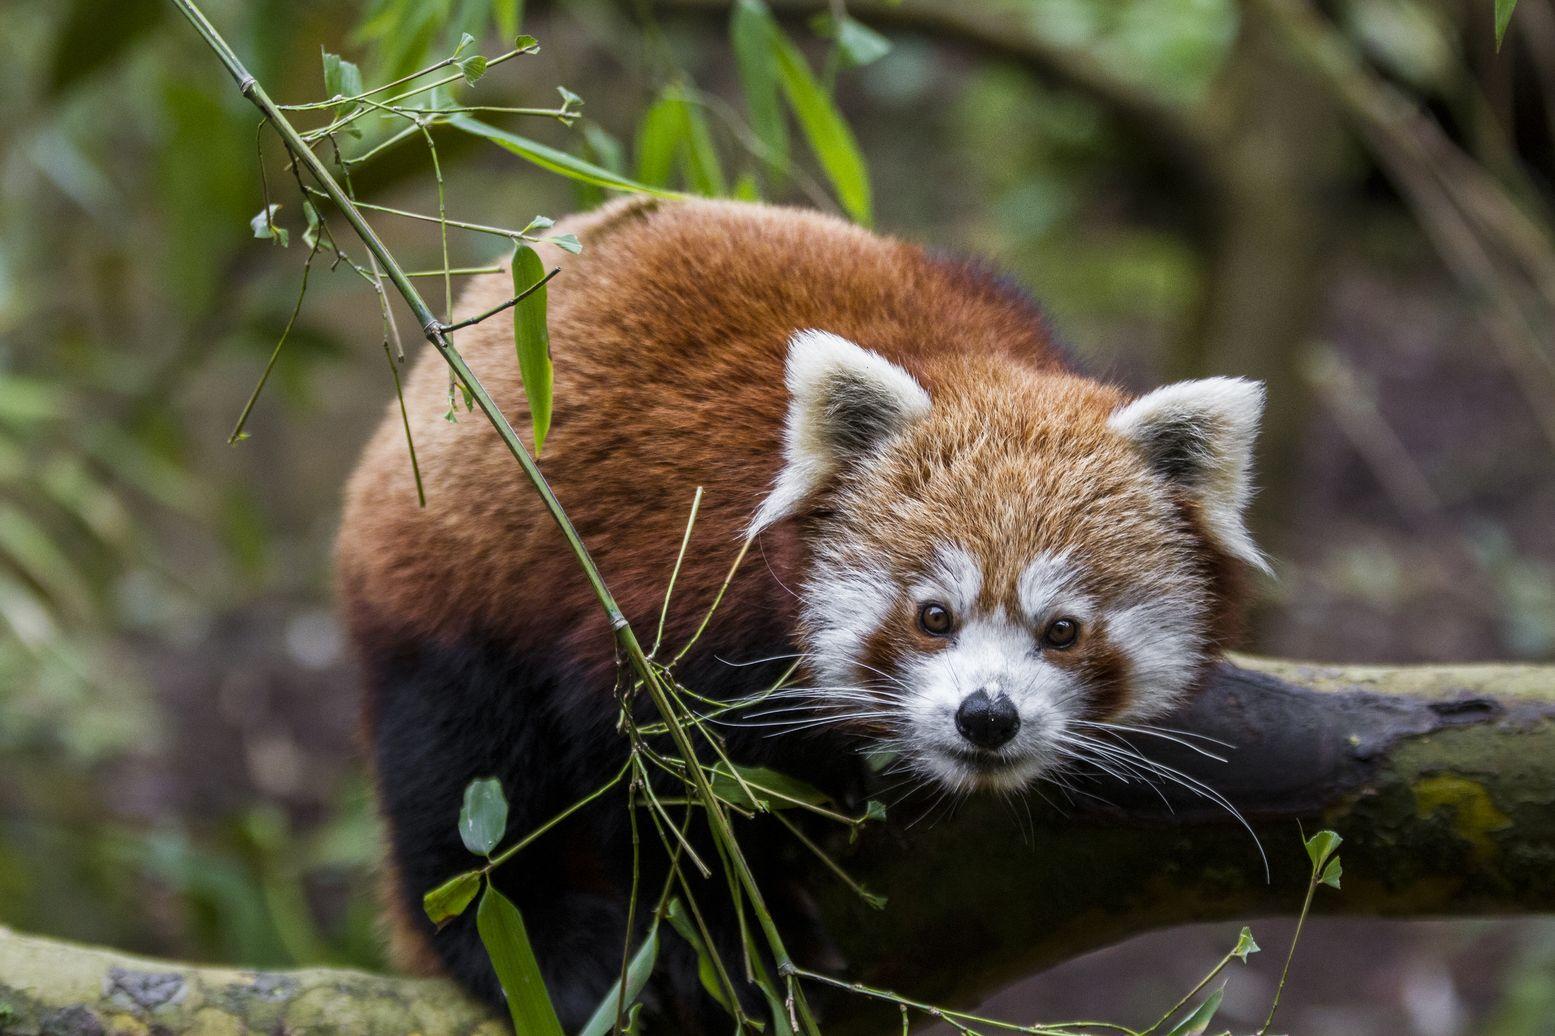 zoo-de-mulhouse-panda-roux-h-chabot